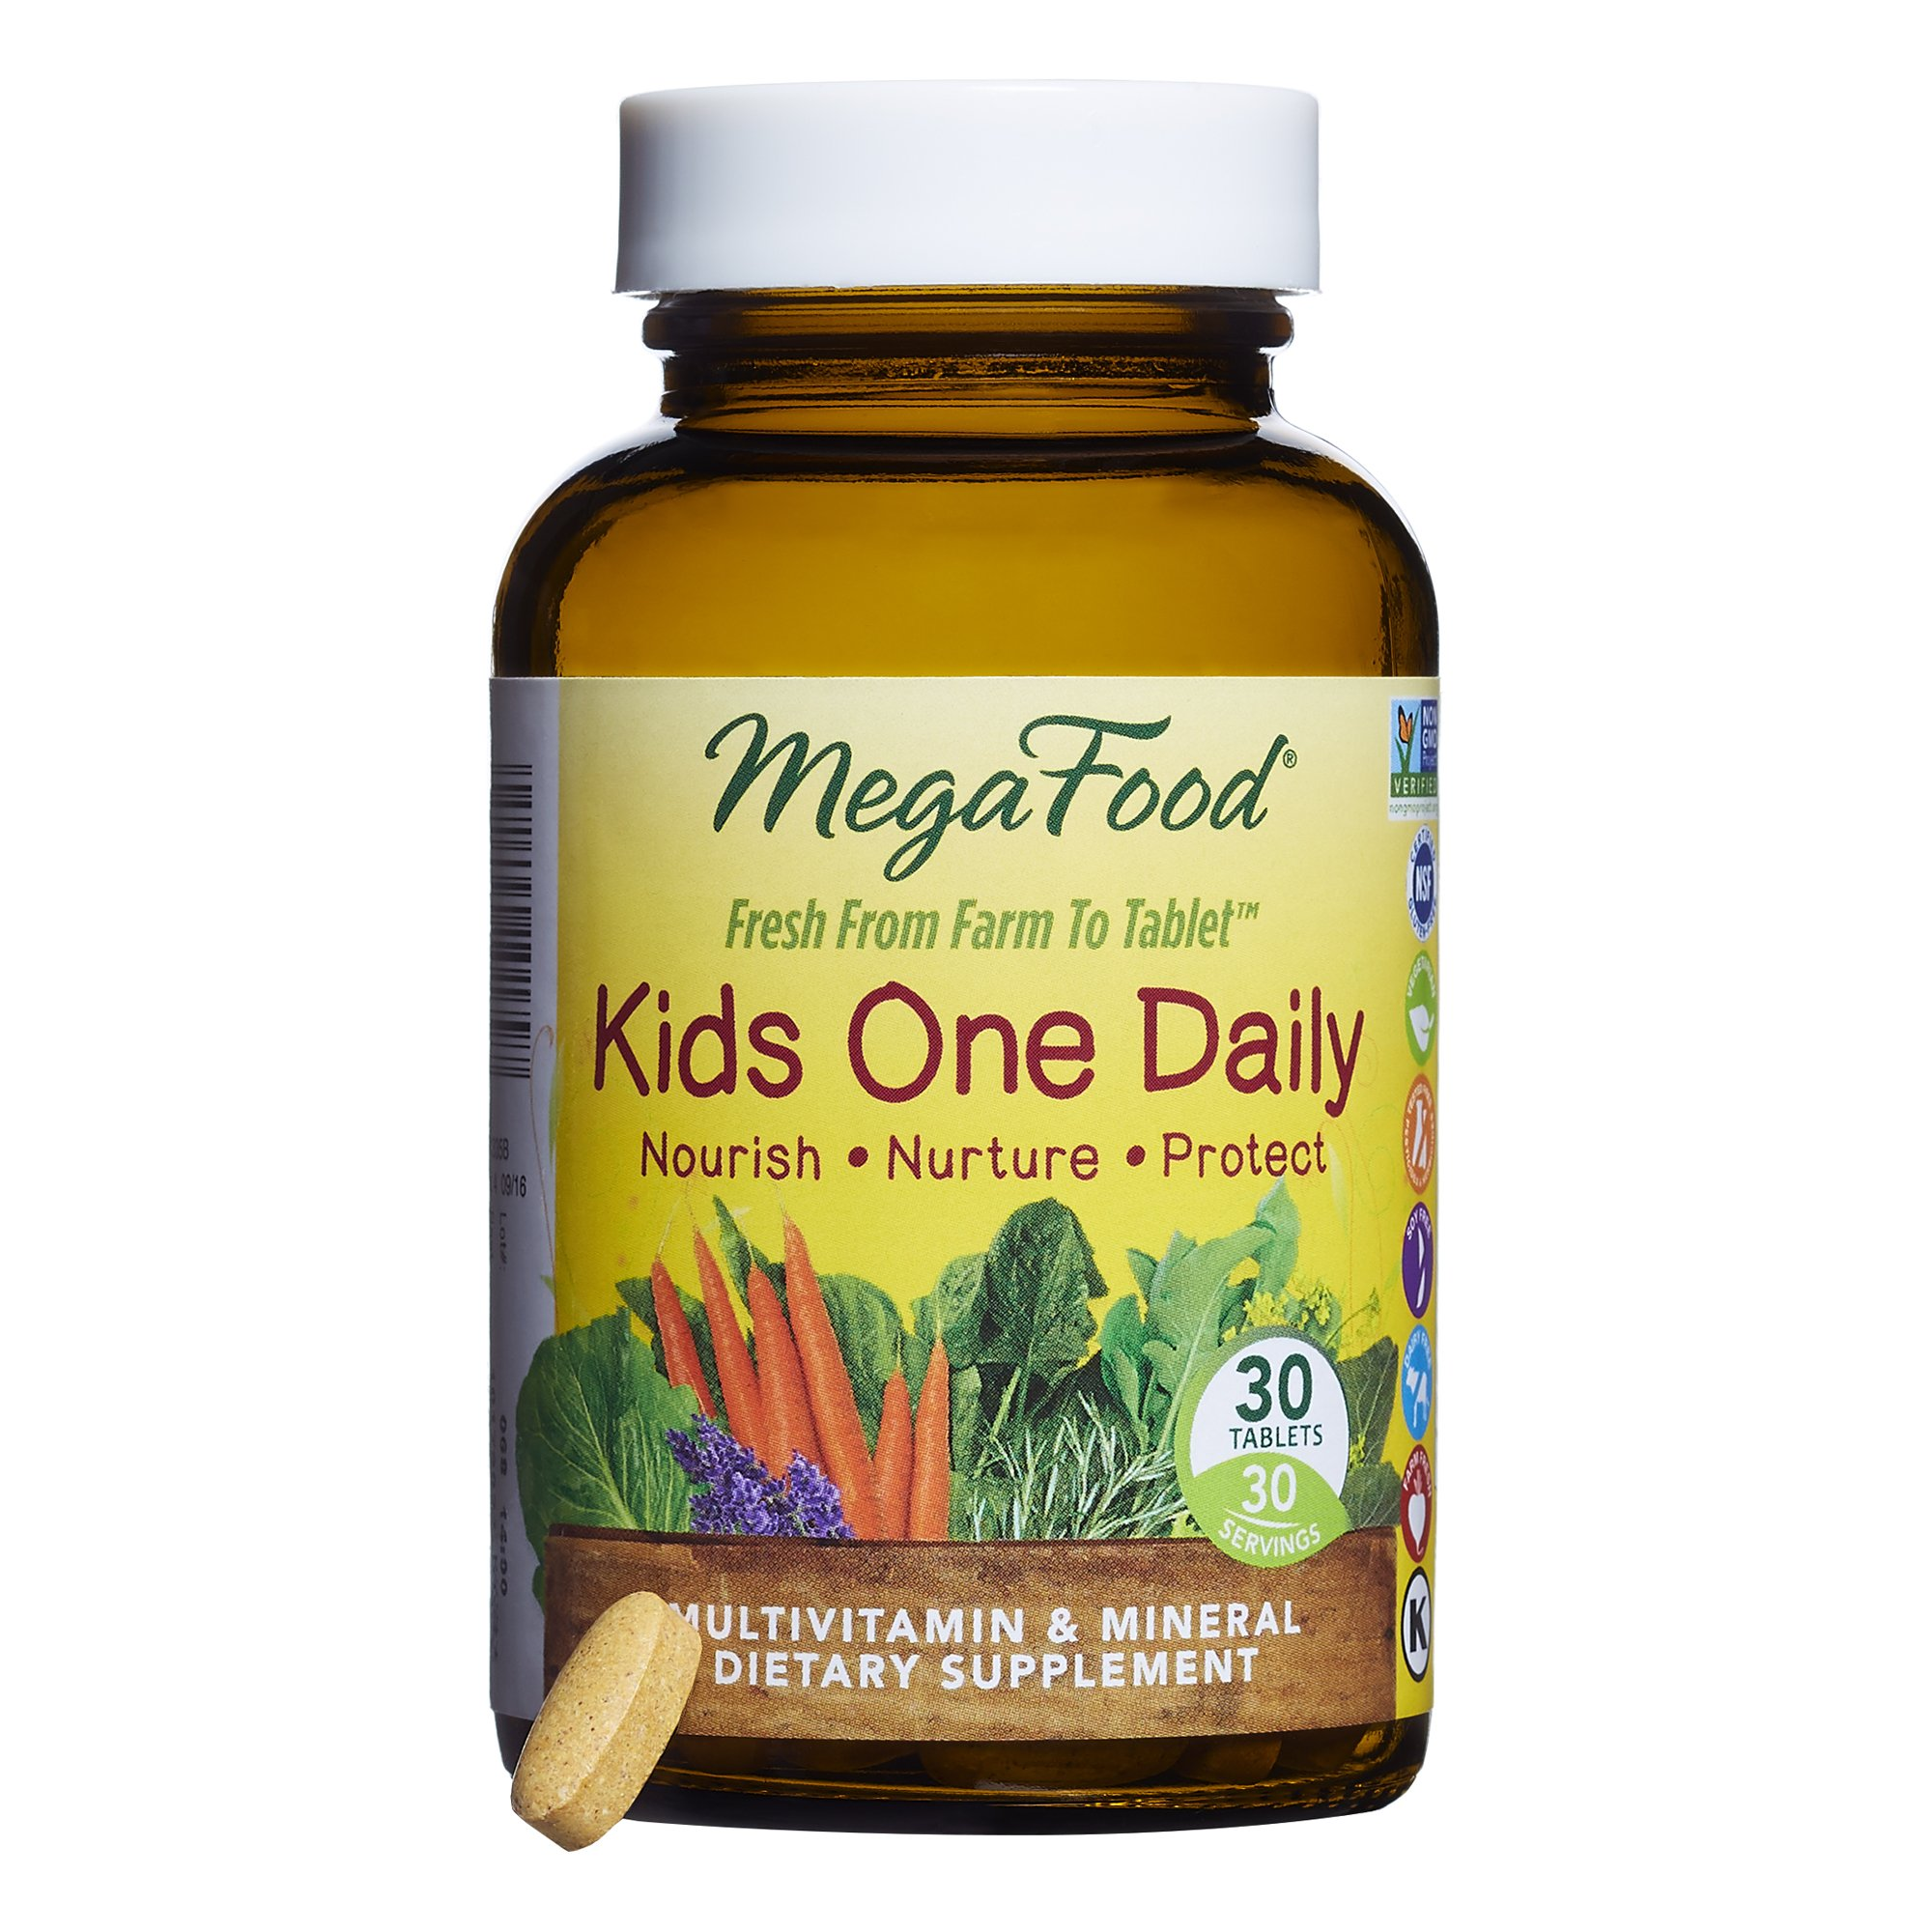 nutrition uts beauty com organic probiotics meijer garden meal gol chocolate kids raw choc health of diet product oz life